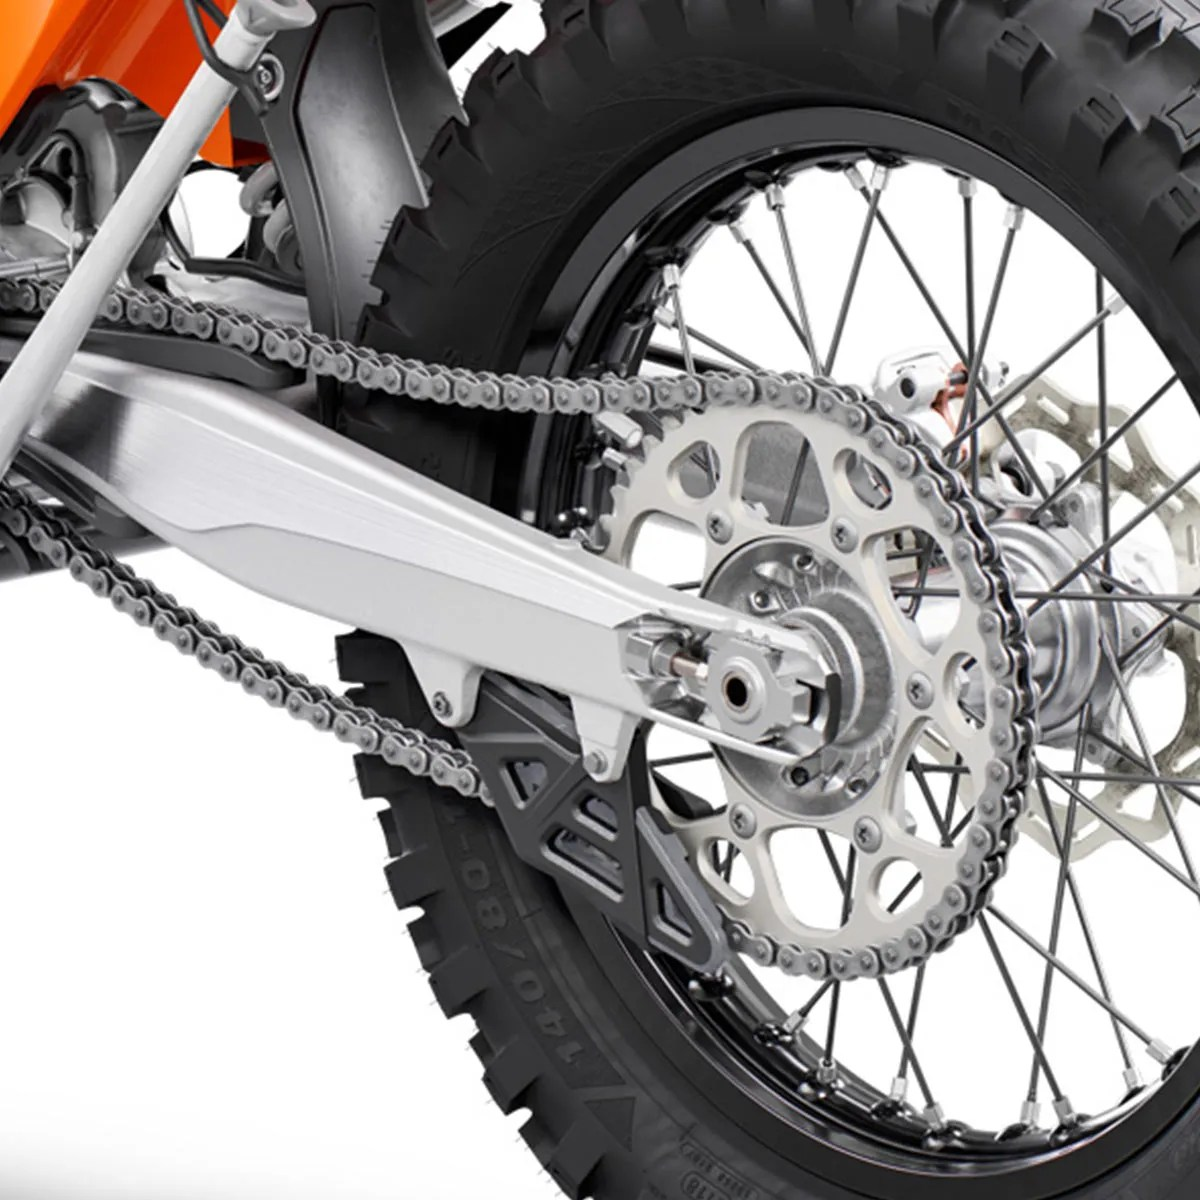 BRAS-OSCILLANT-KTM-300-EXC-TPI-2020